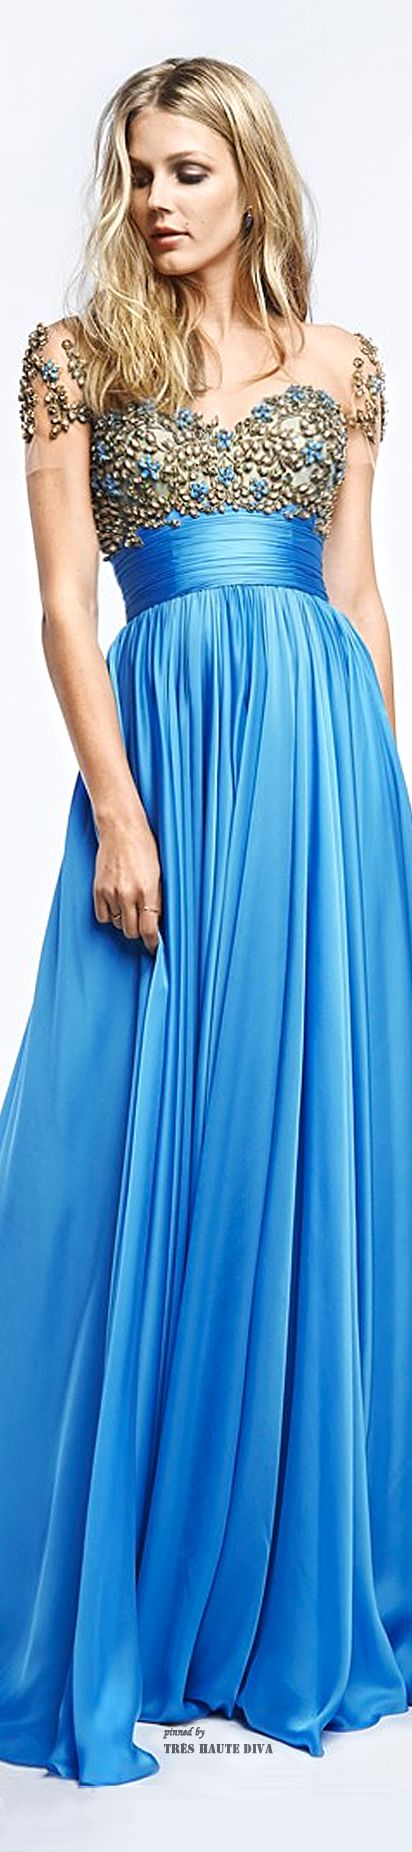 Reem Acra Resort 2015 - robin's-egg blue + beading = beautiful.